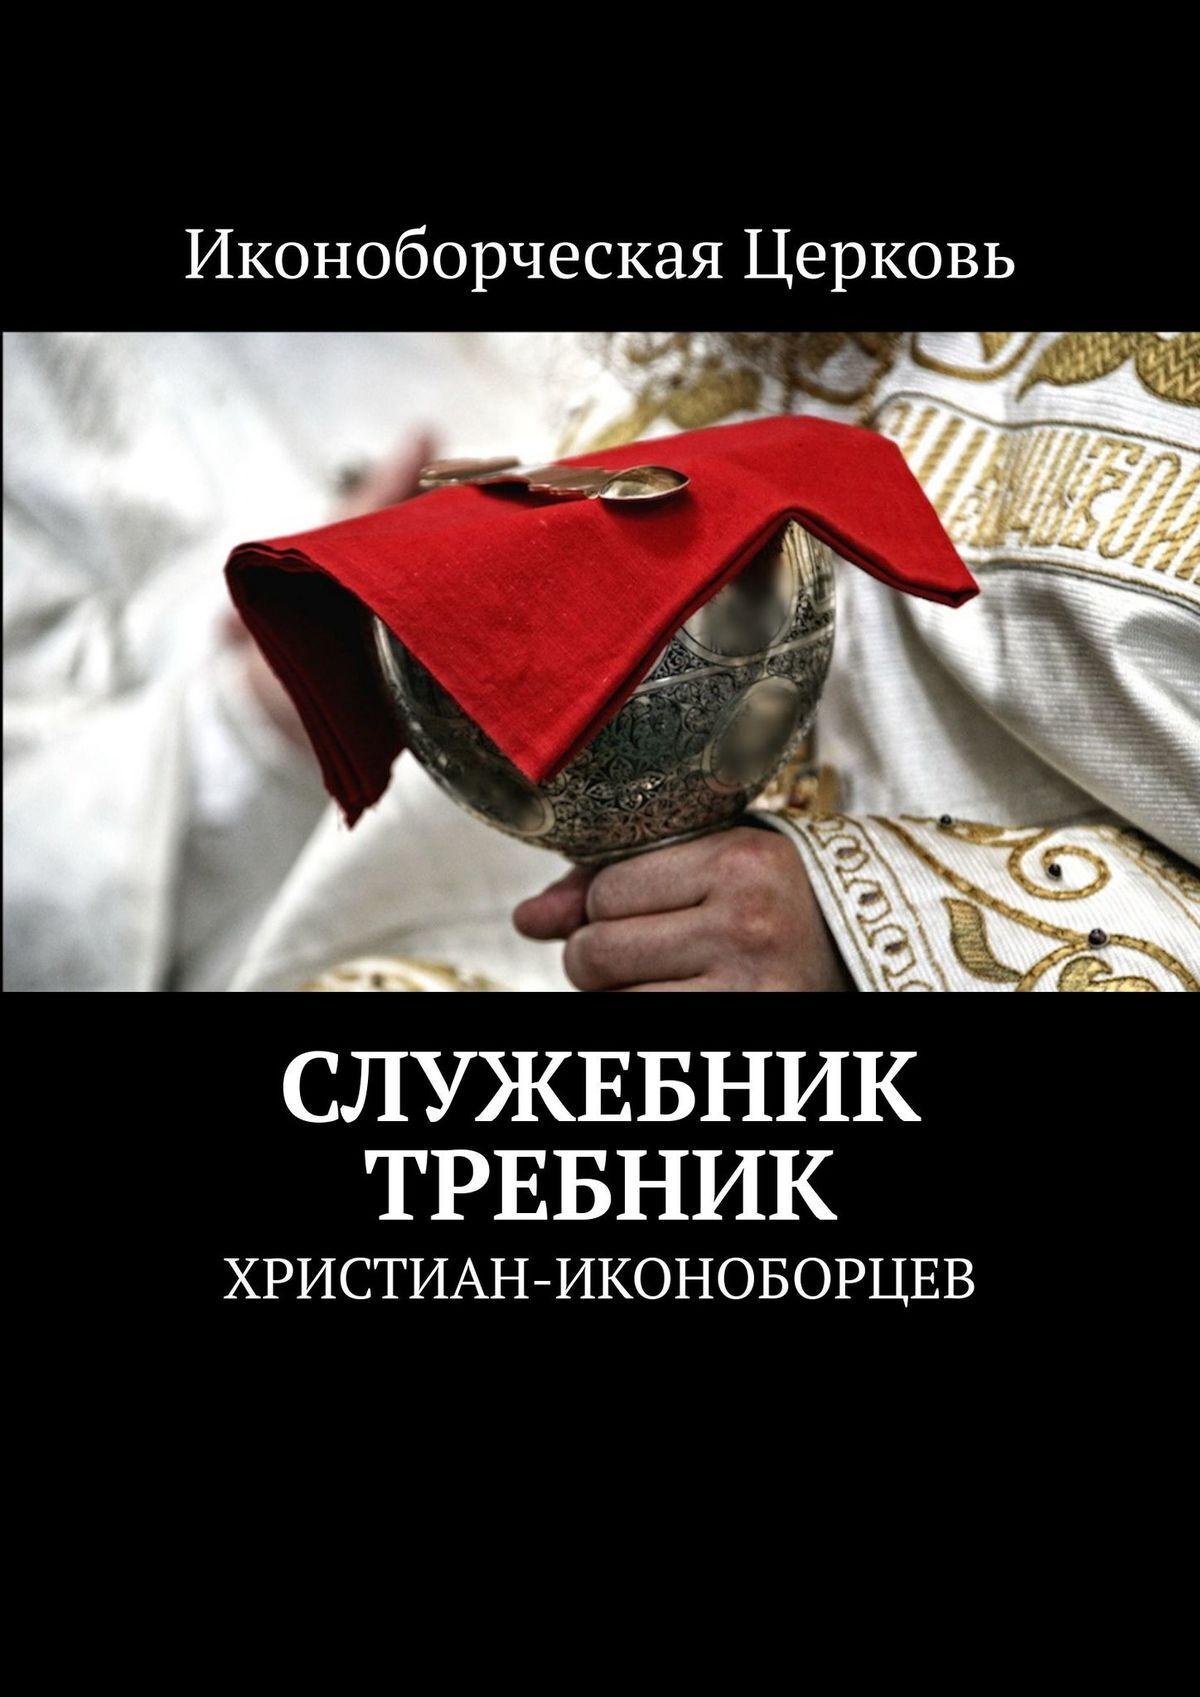 Служебник, Требник христиан-иконоборцев